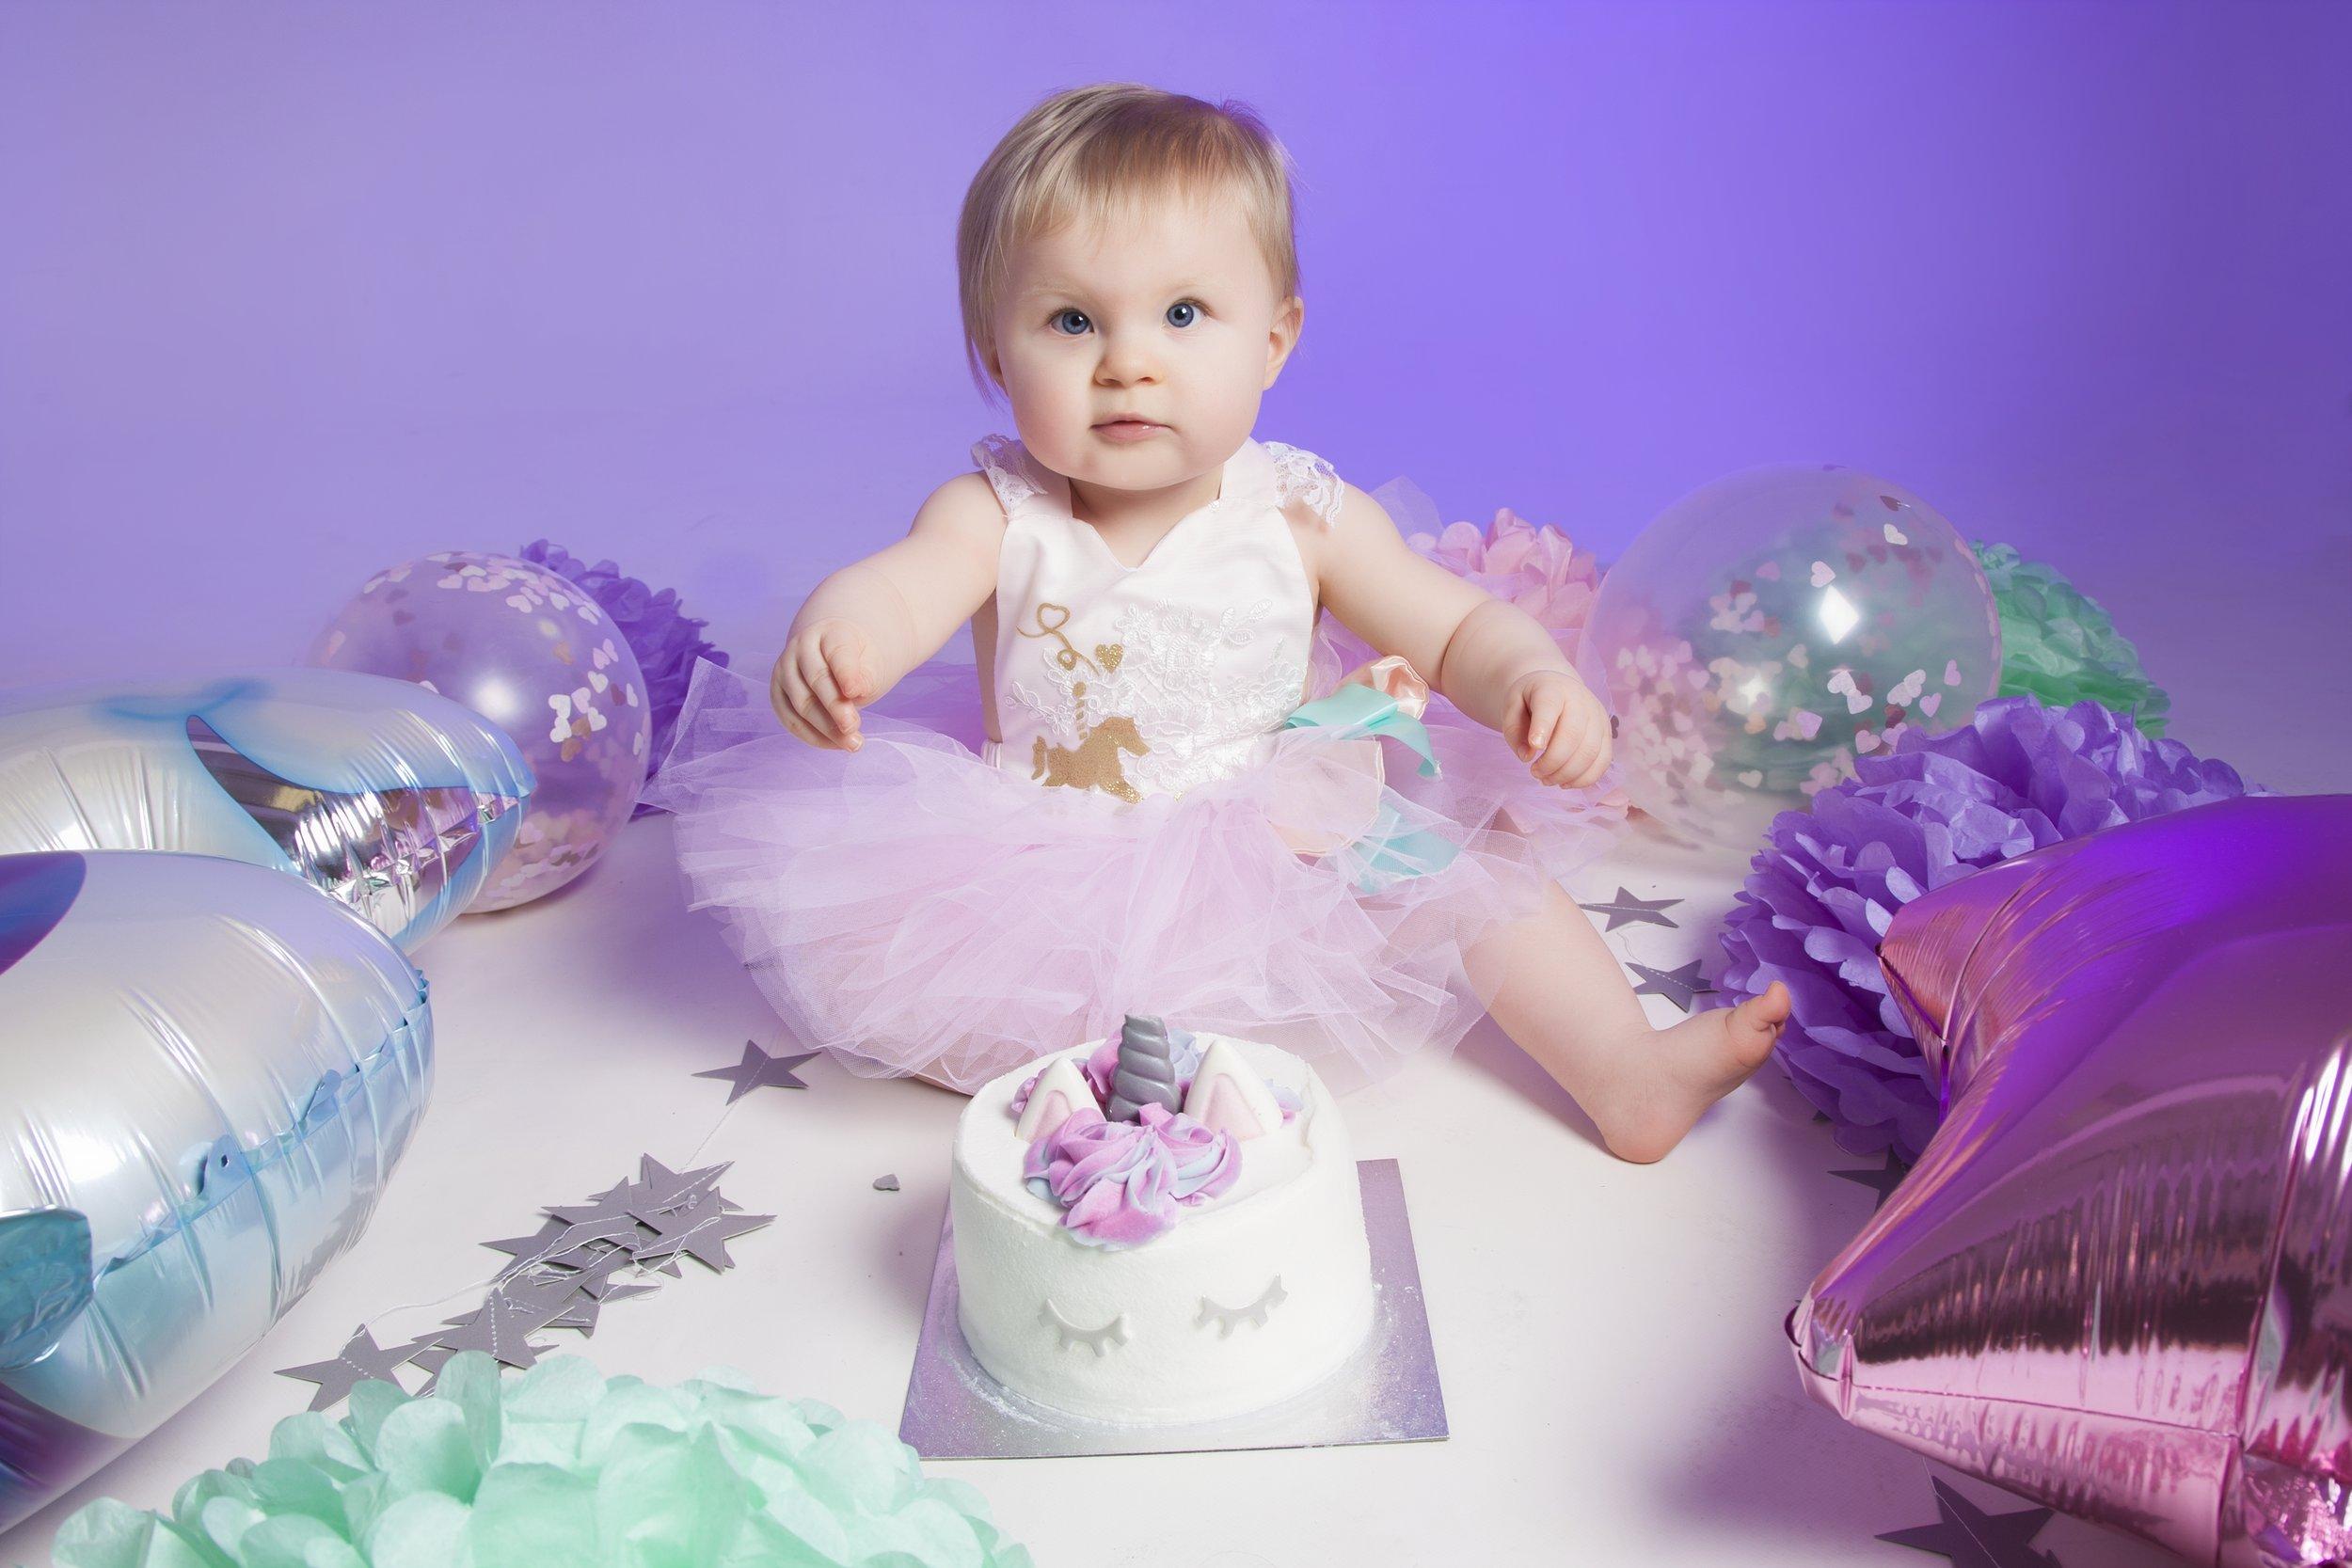 cake-smash-photo-shoot-leicester-photographer-birthday-first-zigzag-zig-zag-photography-le2.JPG